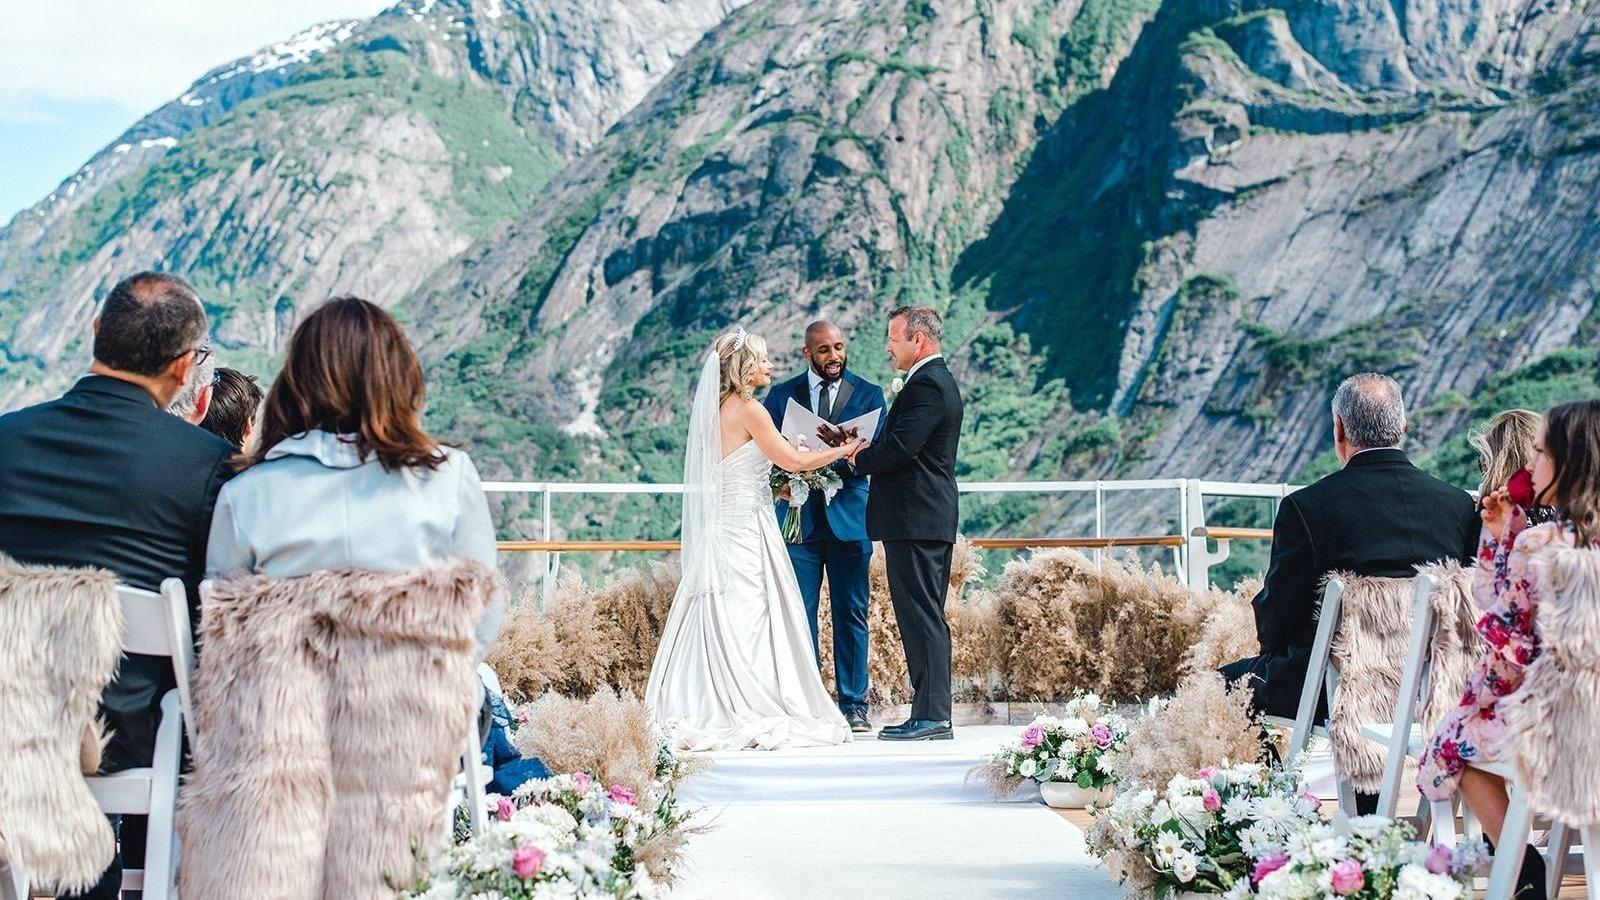 Disney's Fairy Tale Weddings - Season 2 Episode 5 : Made for Loving You